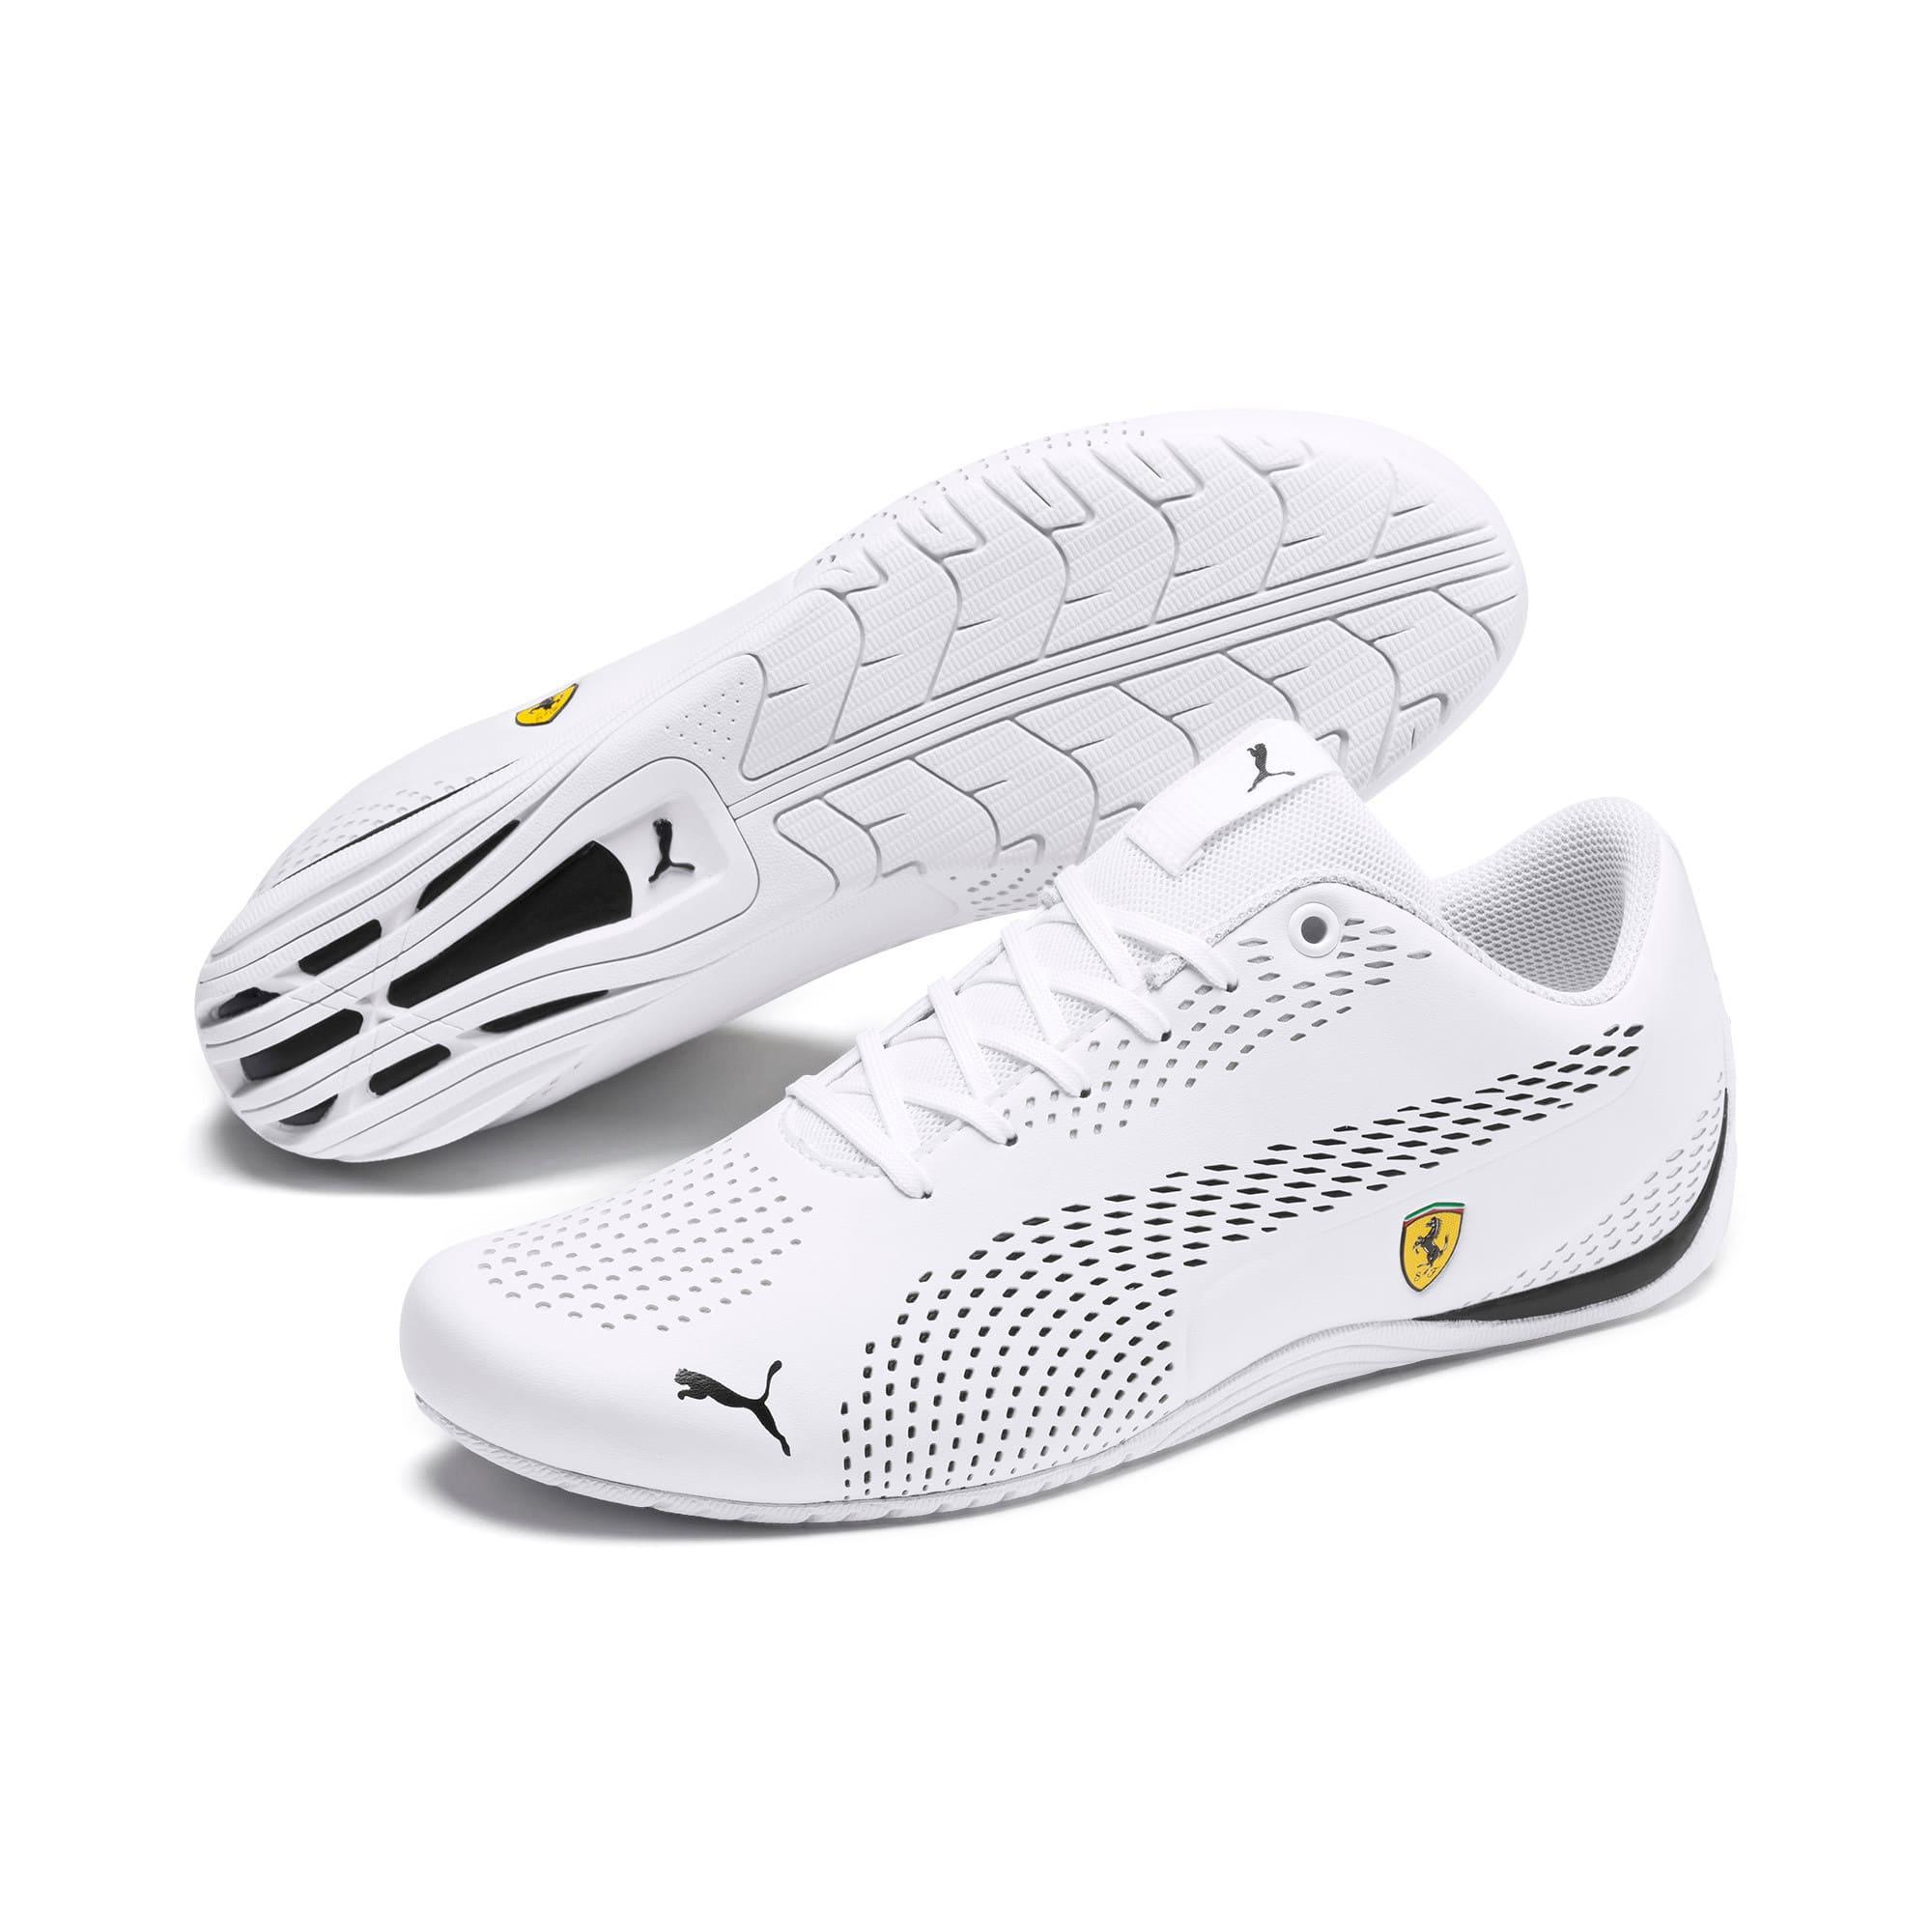 Thumbnail 3 of Ferrari Drift Cat 5 Ultra II sneakers, Puma White-Puma Black, medium